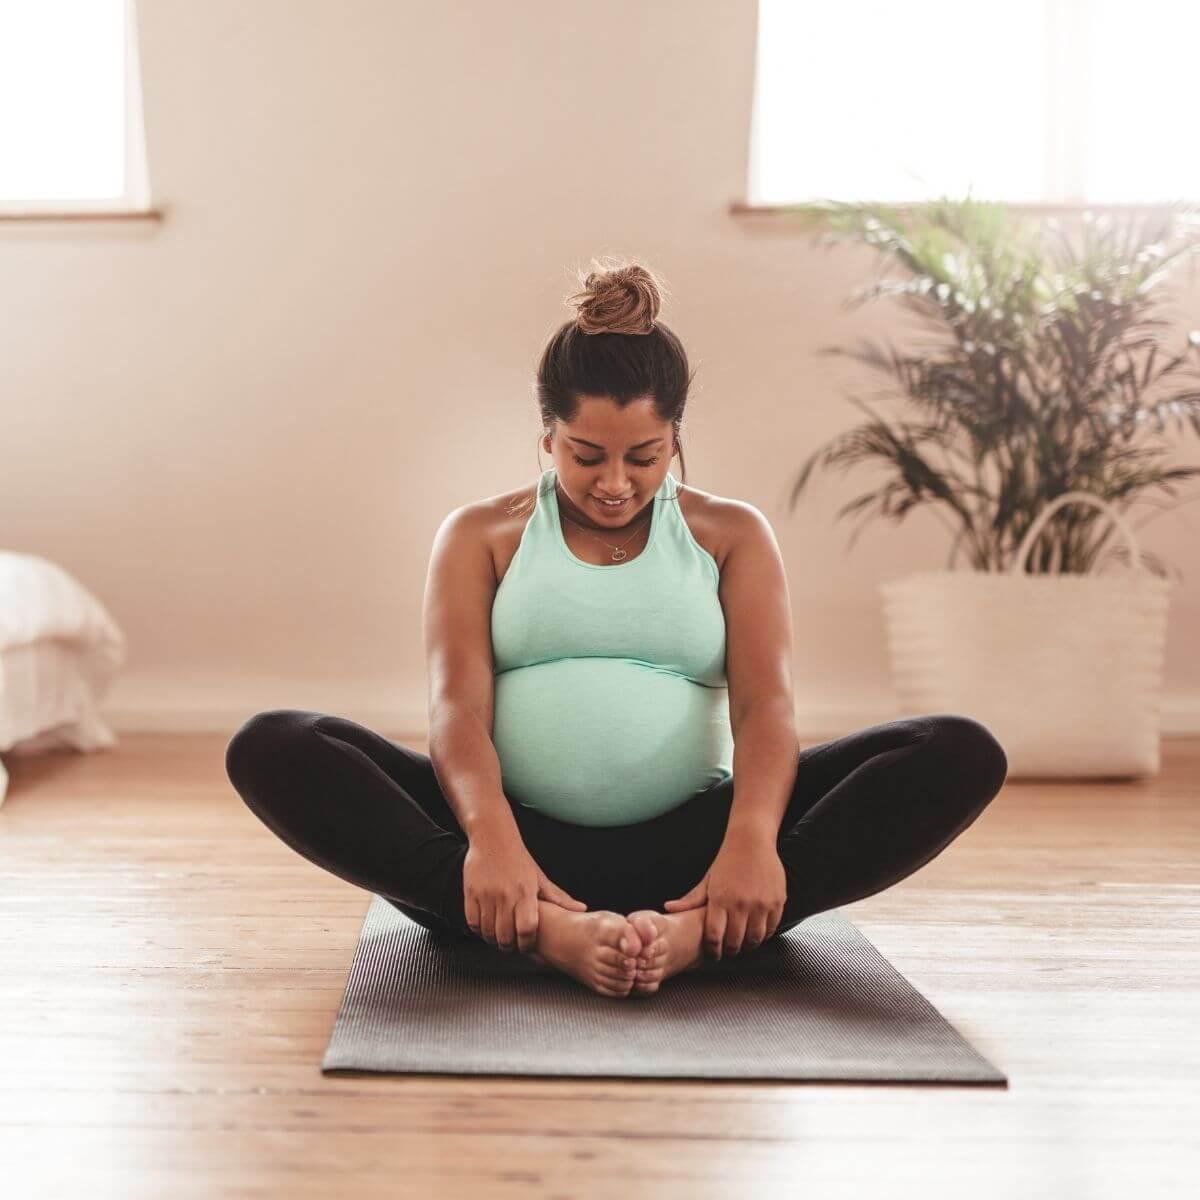 Pregnancy Bloat- Woman doing Yoga